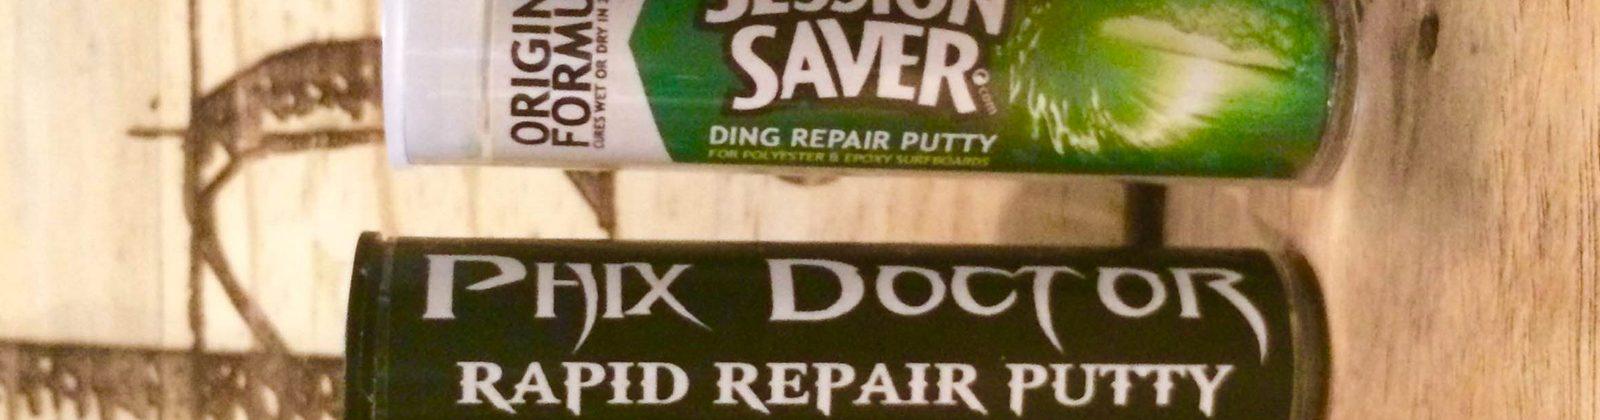 Phix-Doctor